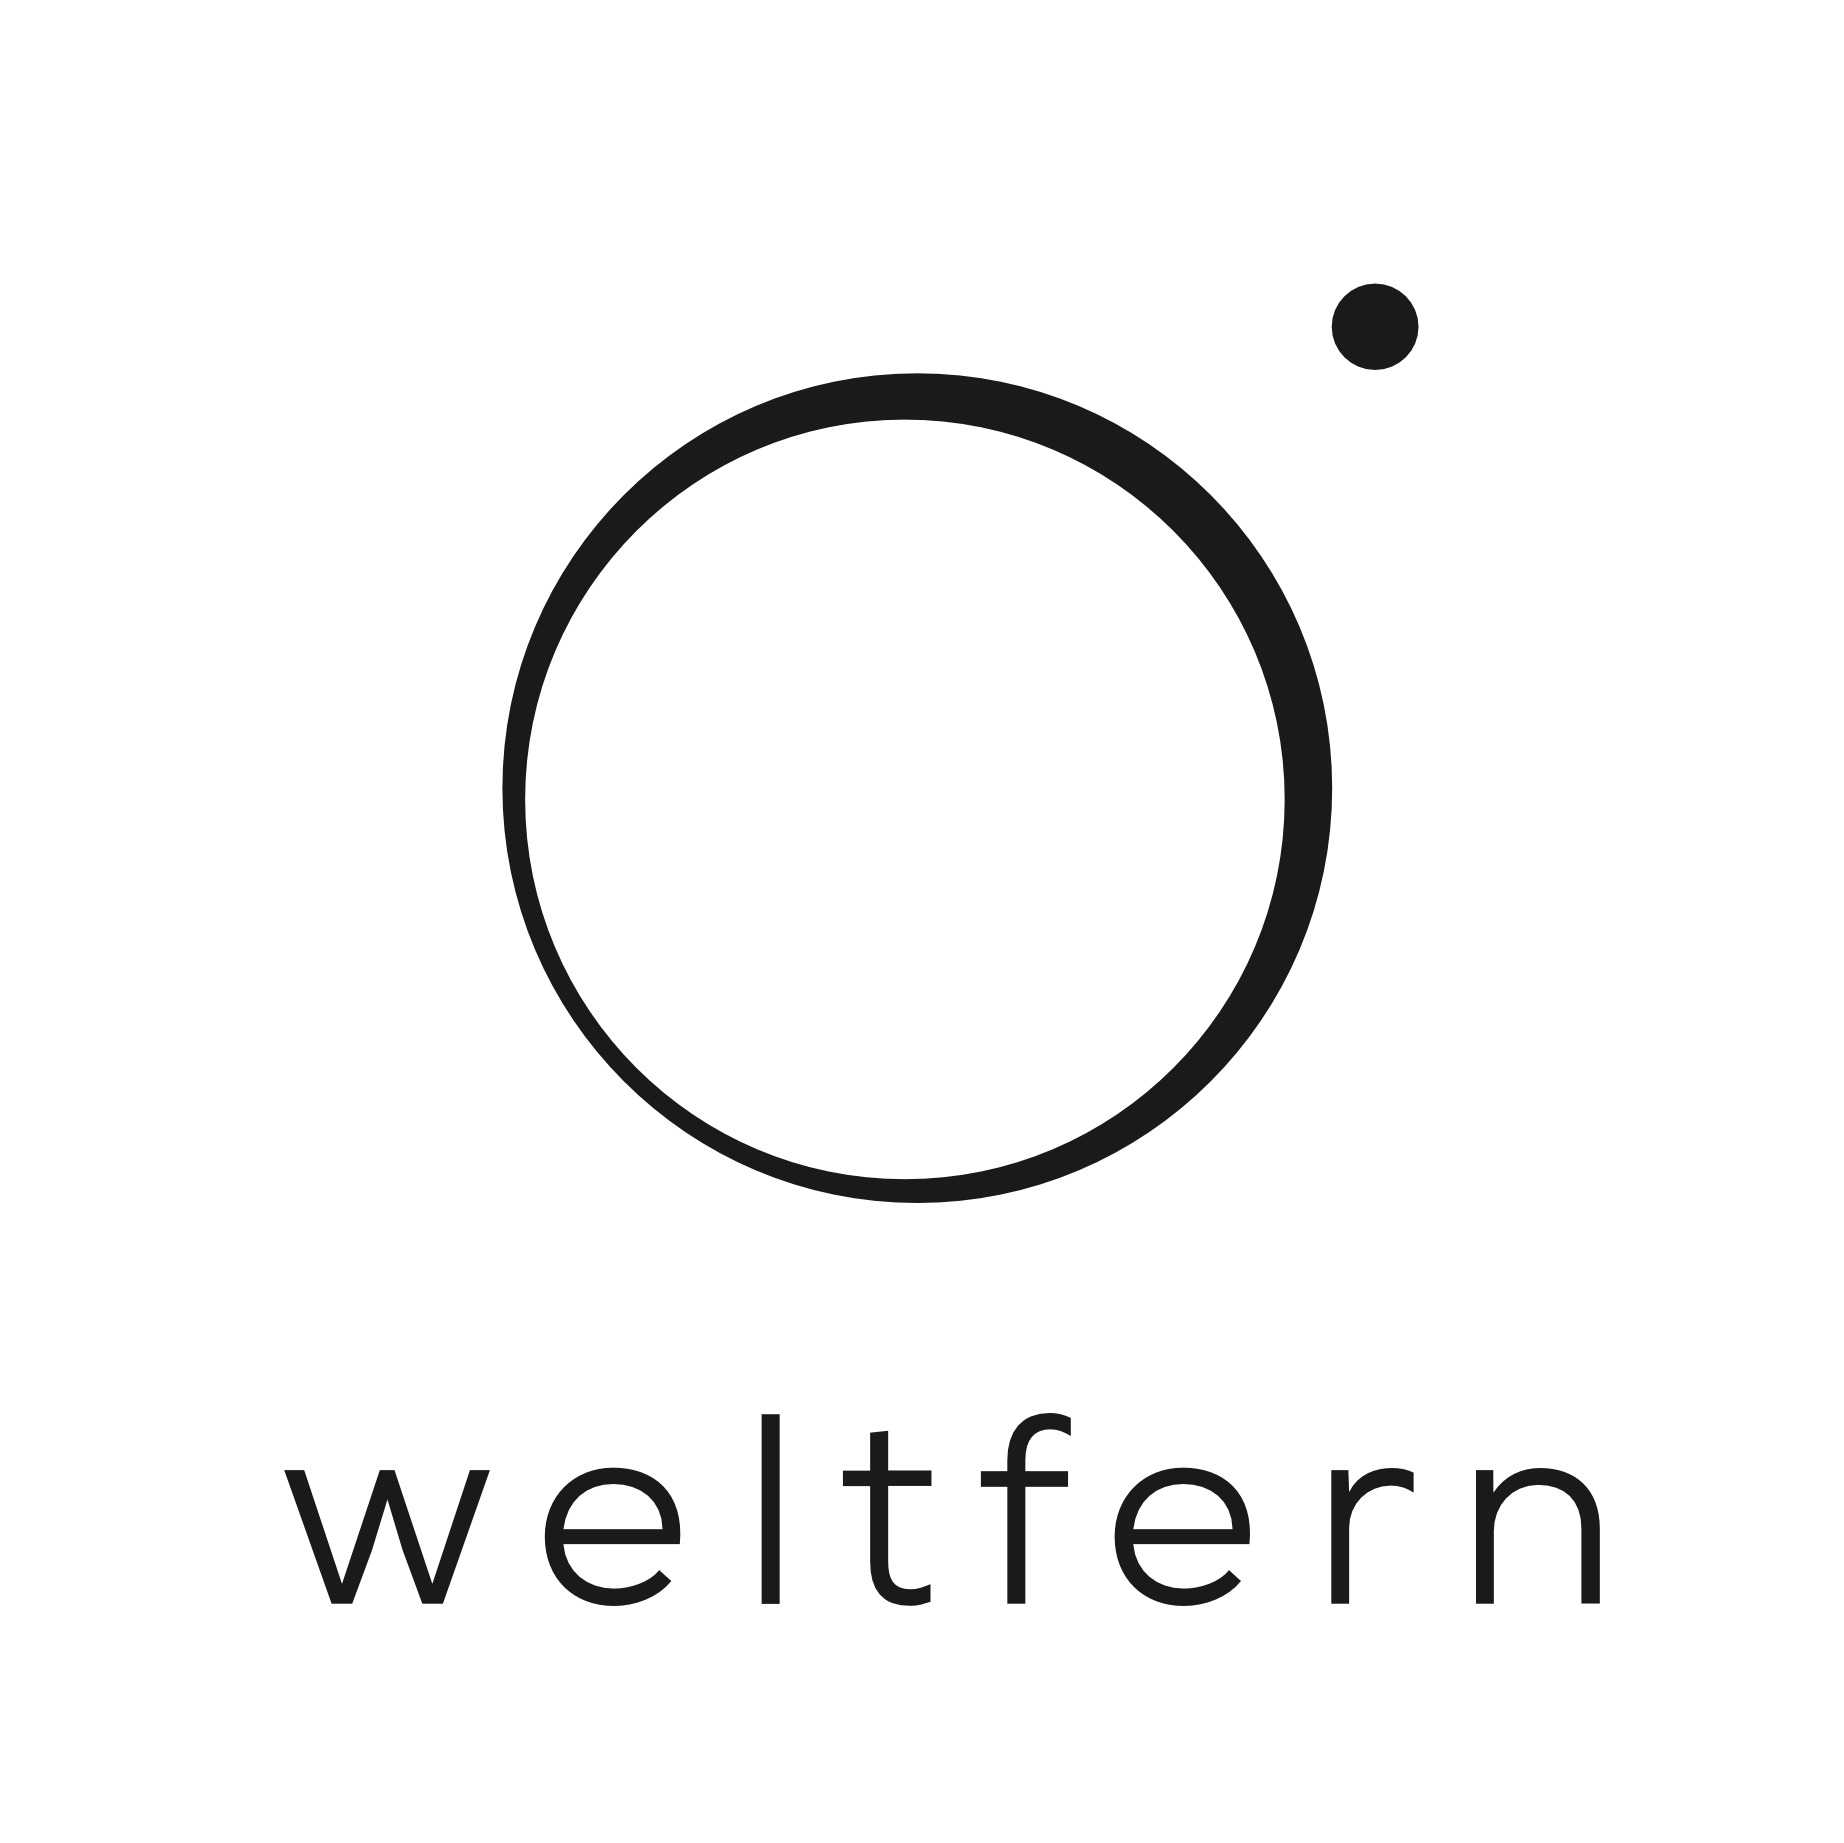 weltfern-square-schwarz